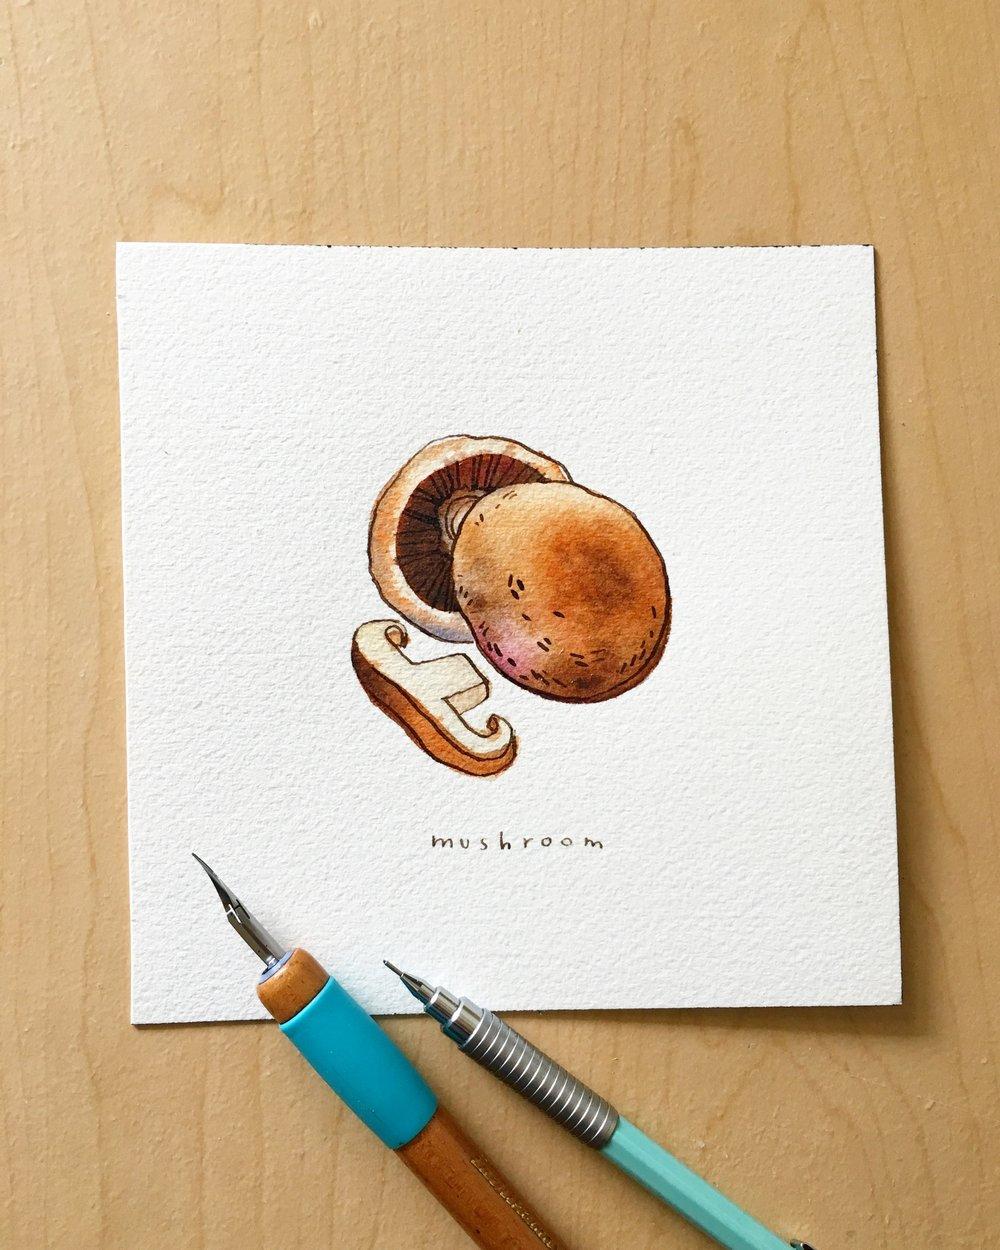 mushroom01.jpg